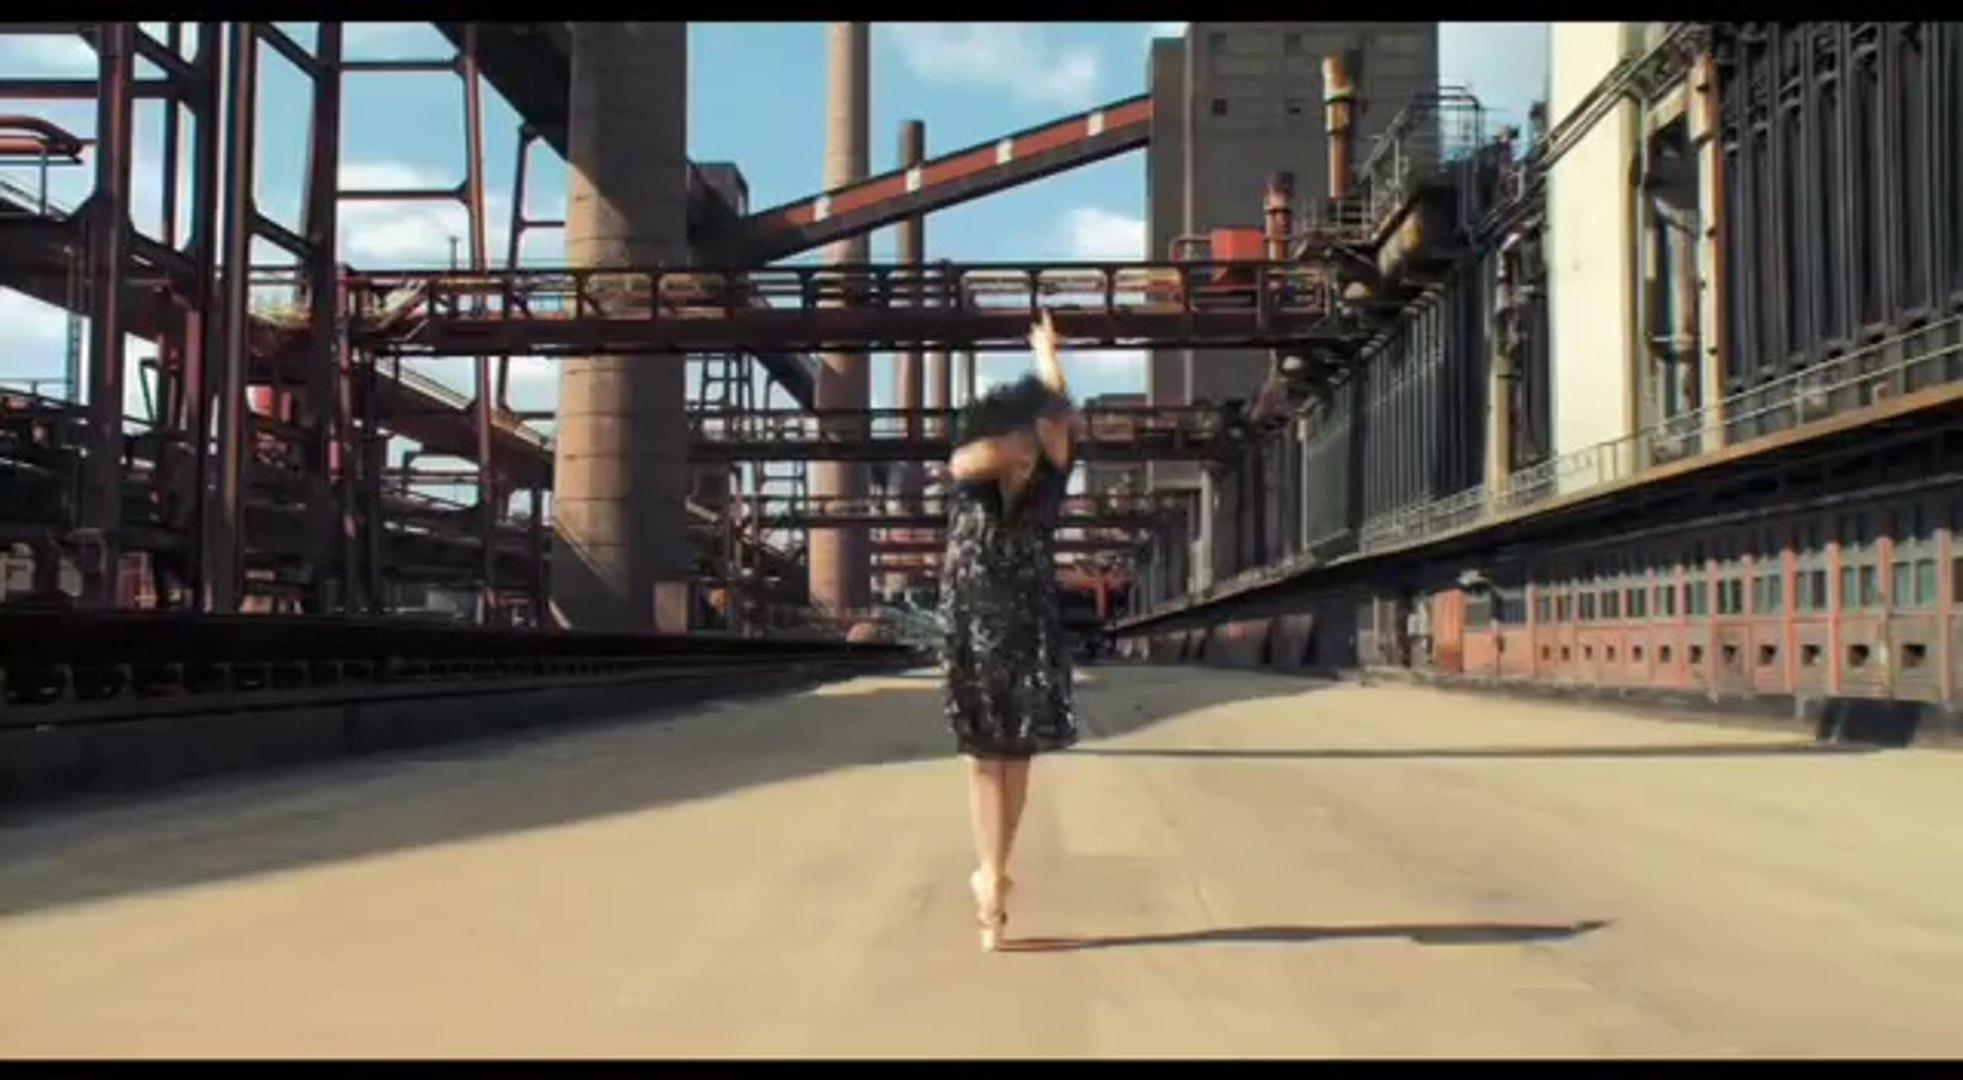 Pina | Trailer D (2011) 3D Berlinale 2011 Wim Wenders